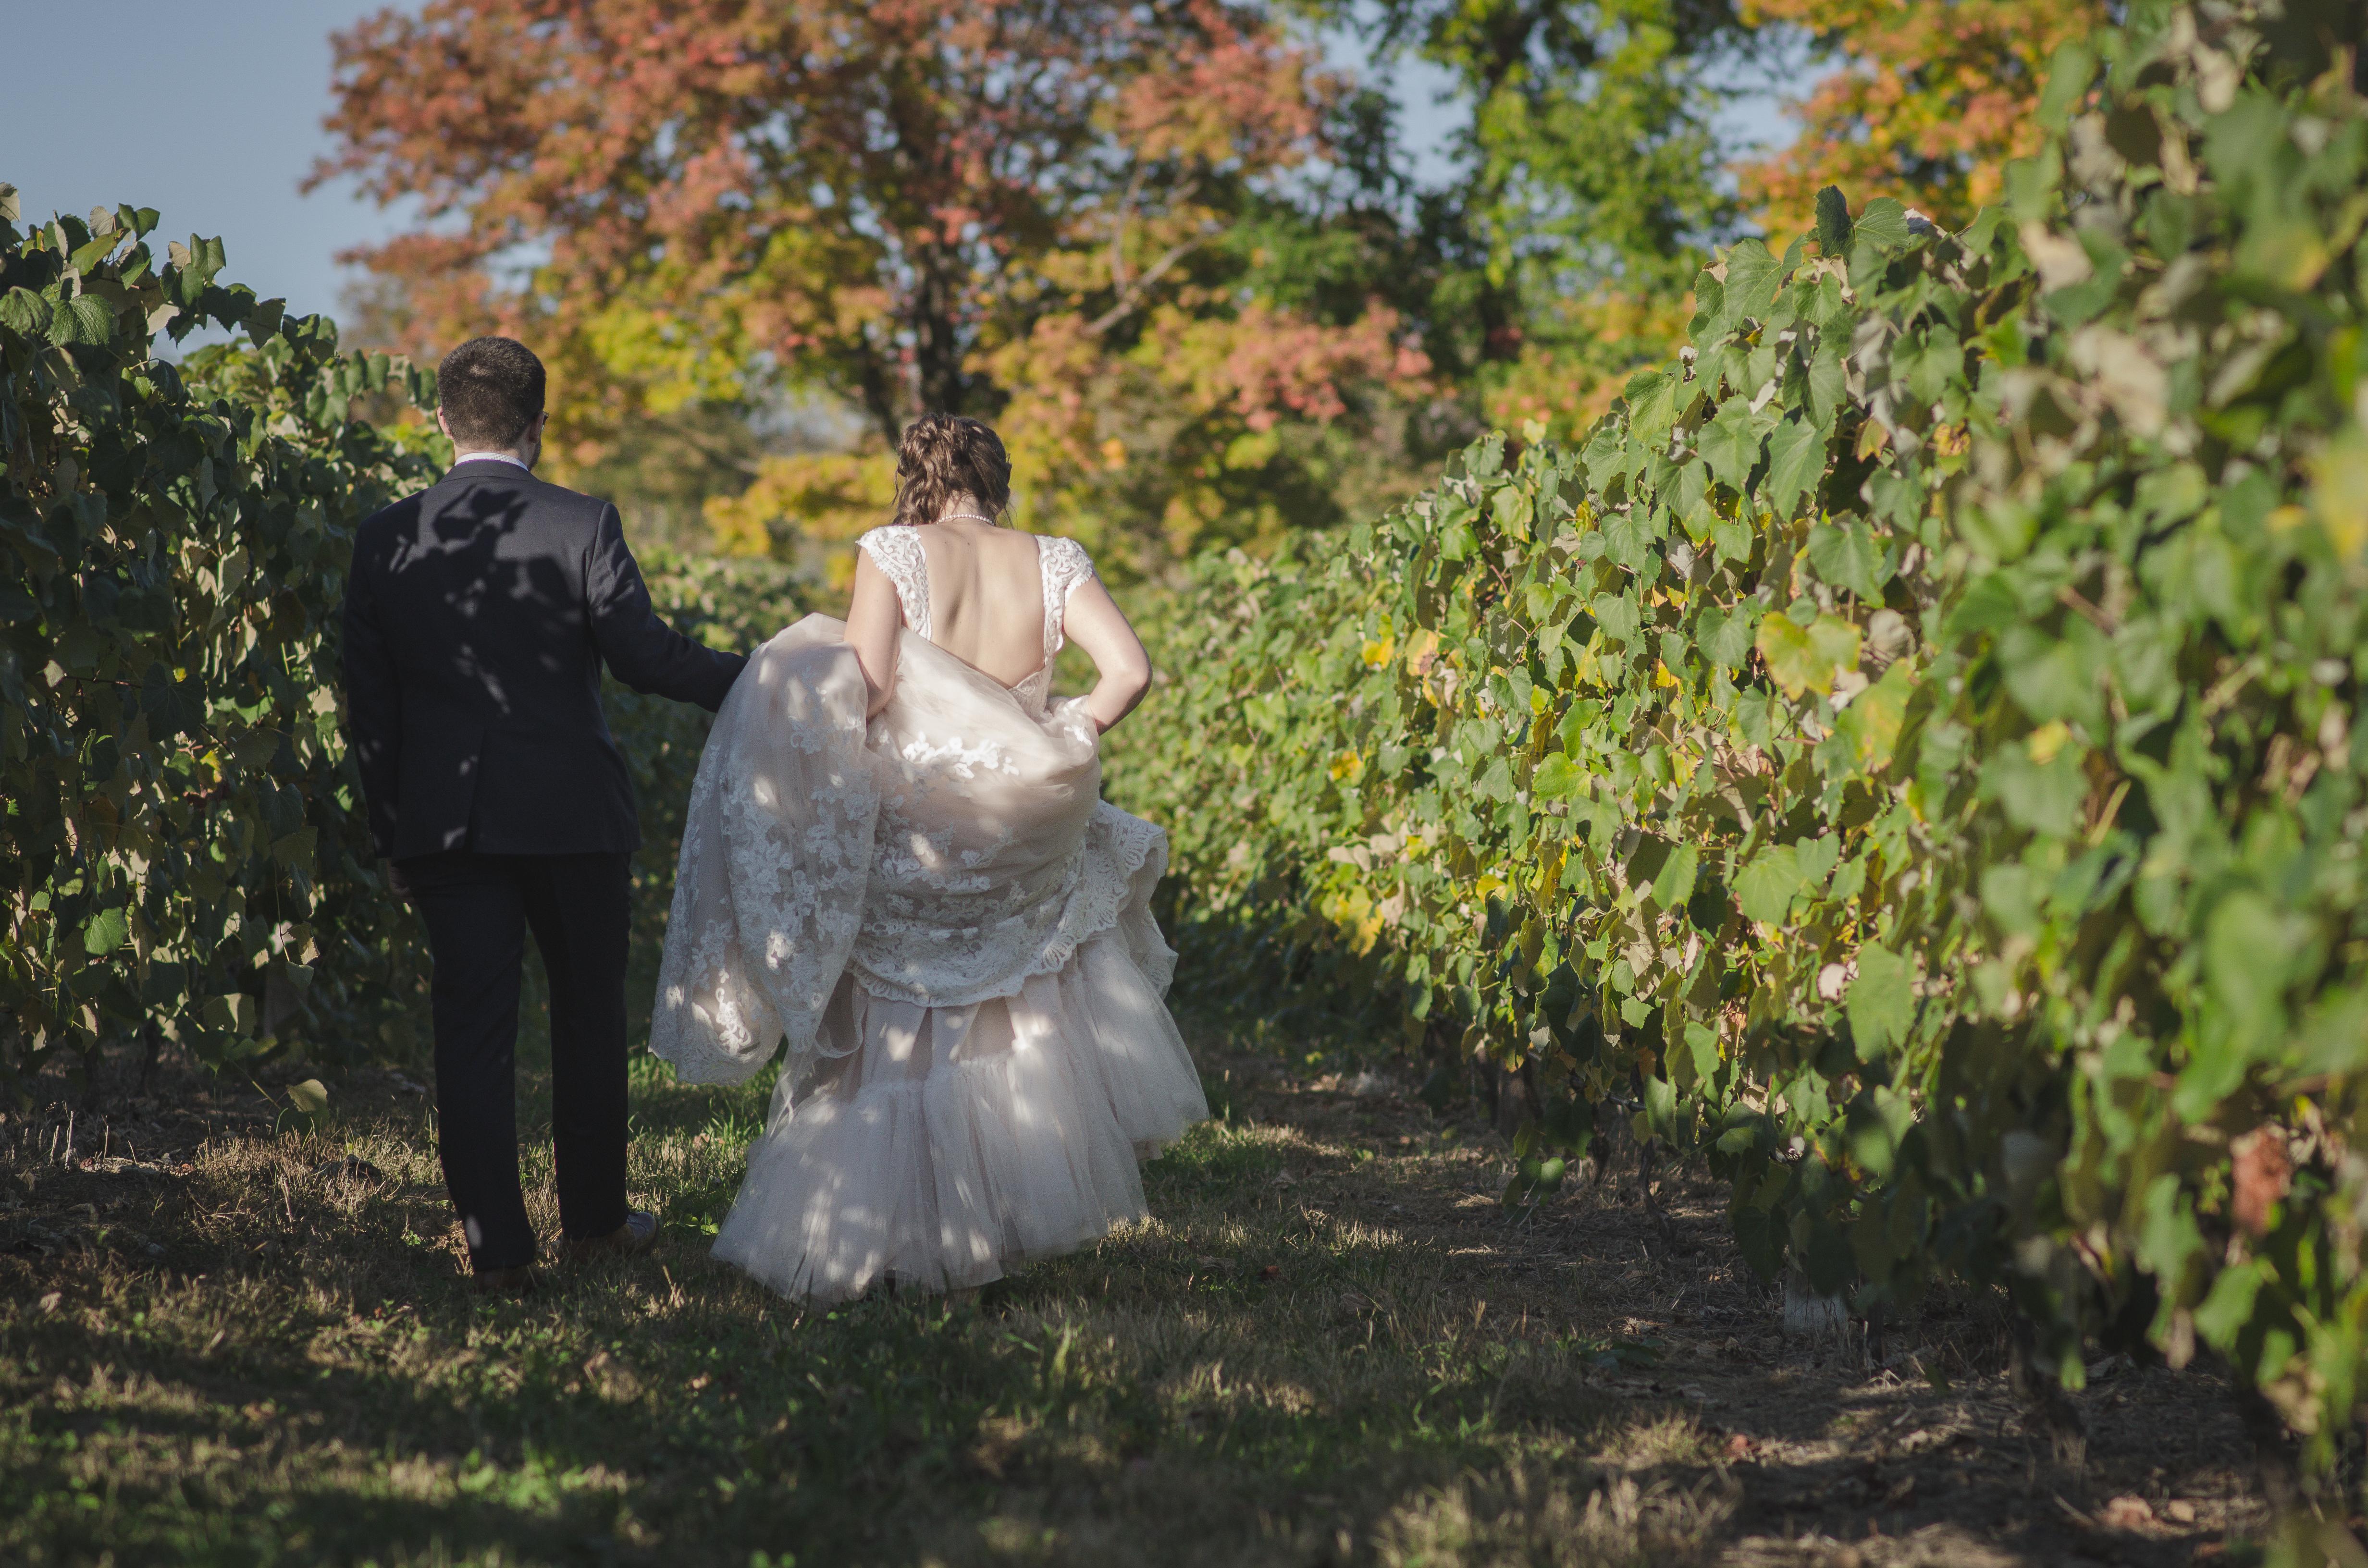 Bad Seed Cider Wedding in Highland, NY